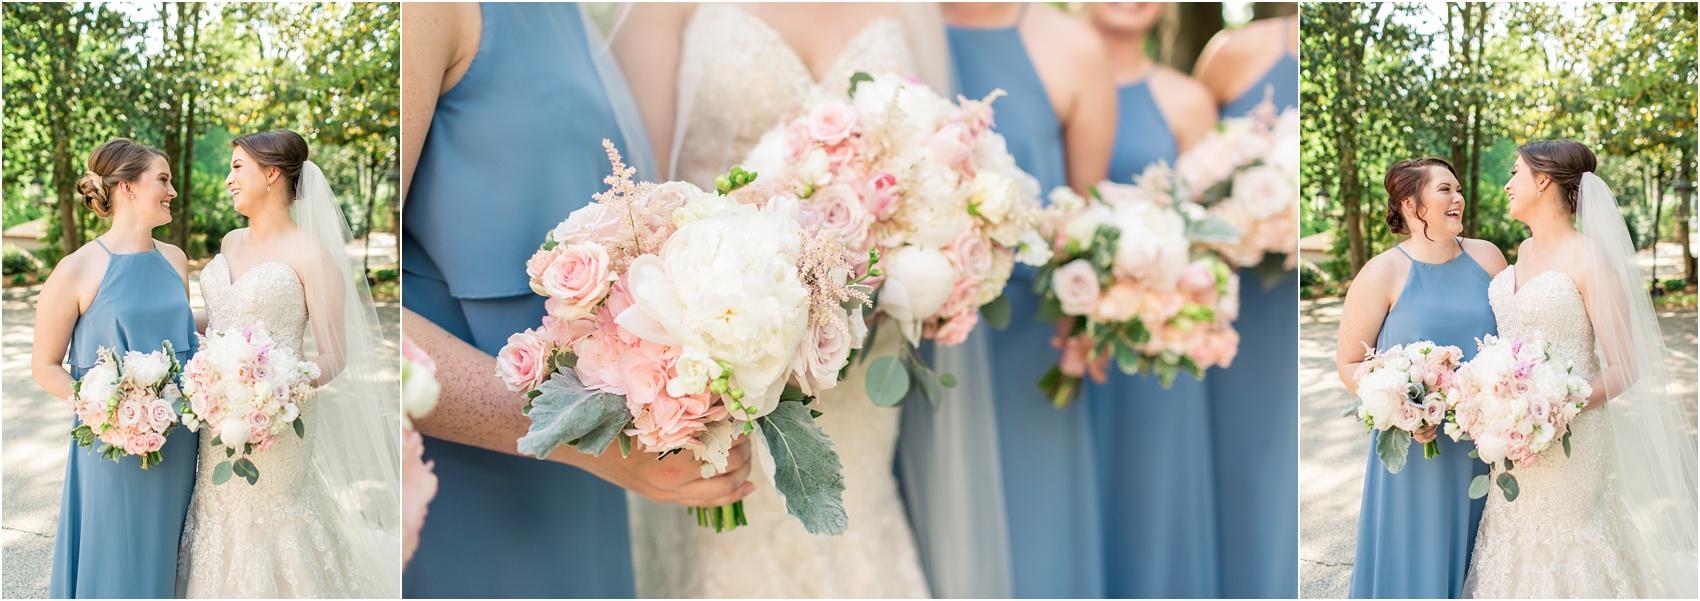 Savannah Eve Photography- Nutt Wedding- Blog-57.jpg